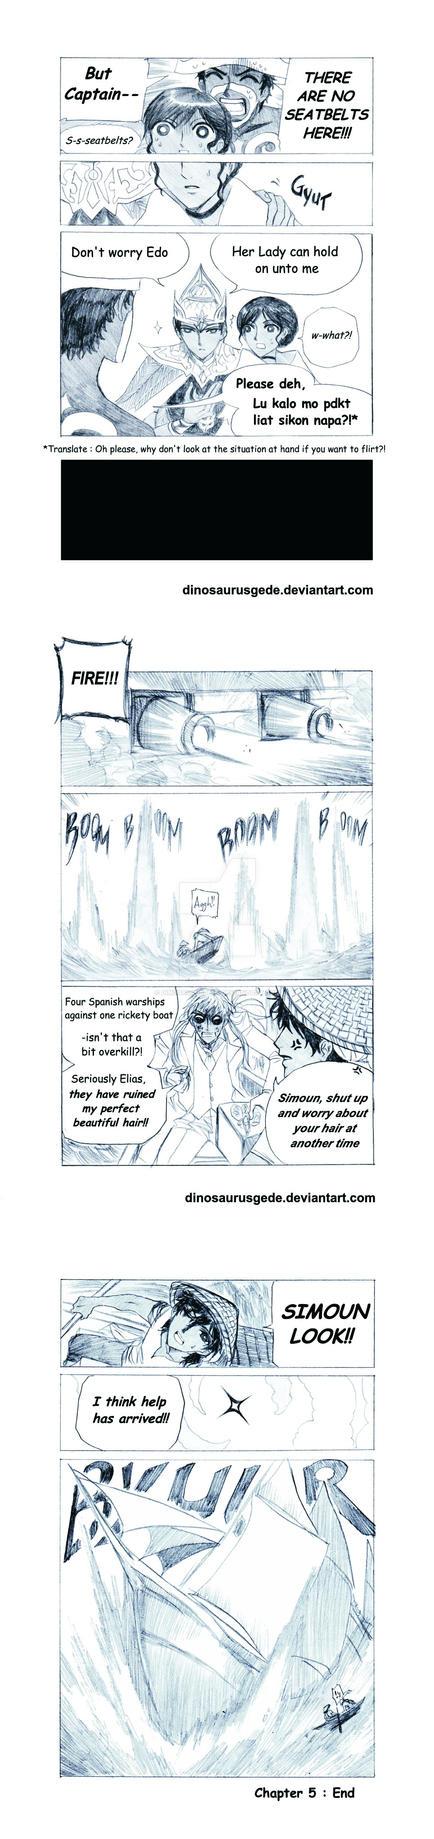 Nagaraja Chapter 5 Part 8 by dinosaurusgede